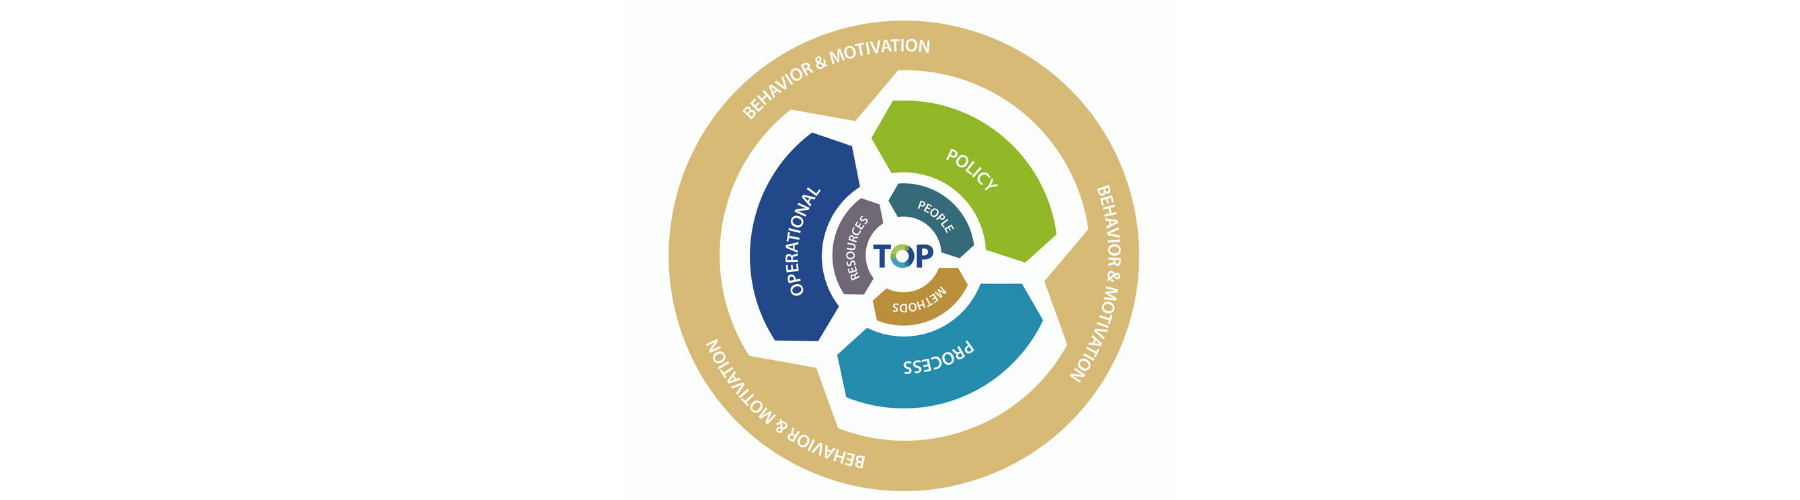 TOP Advies circle model